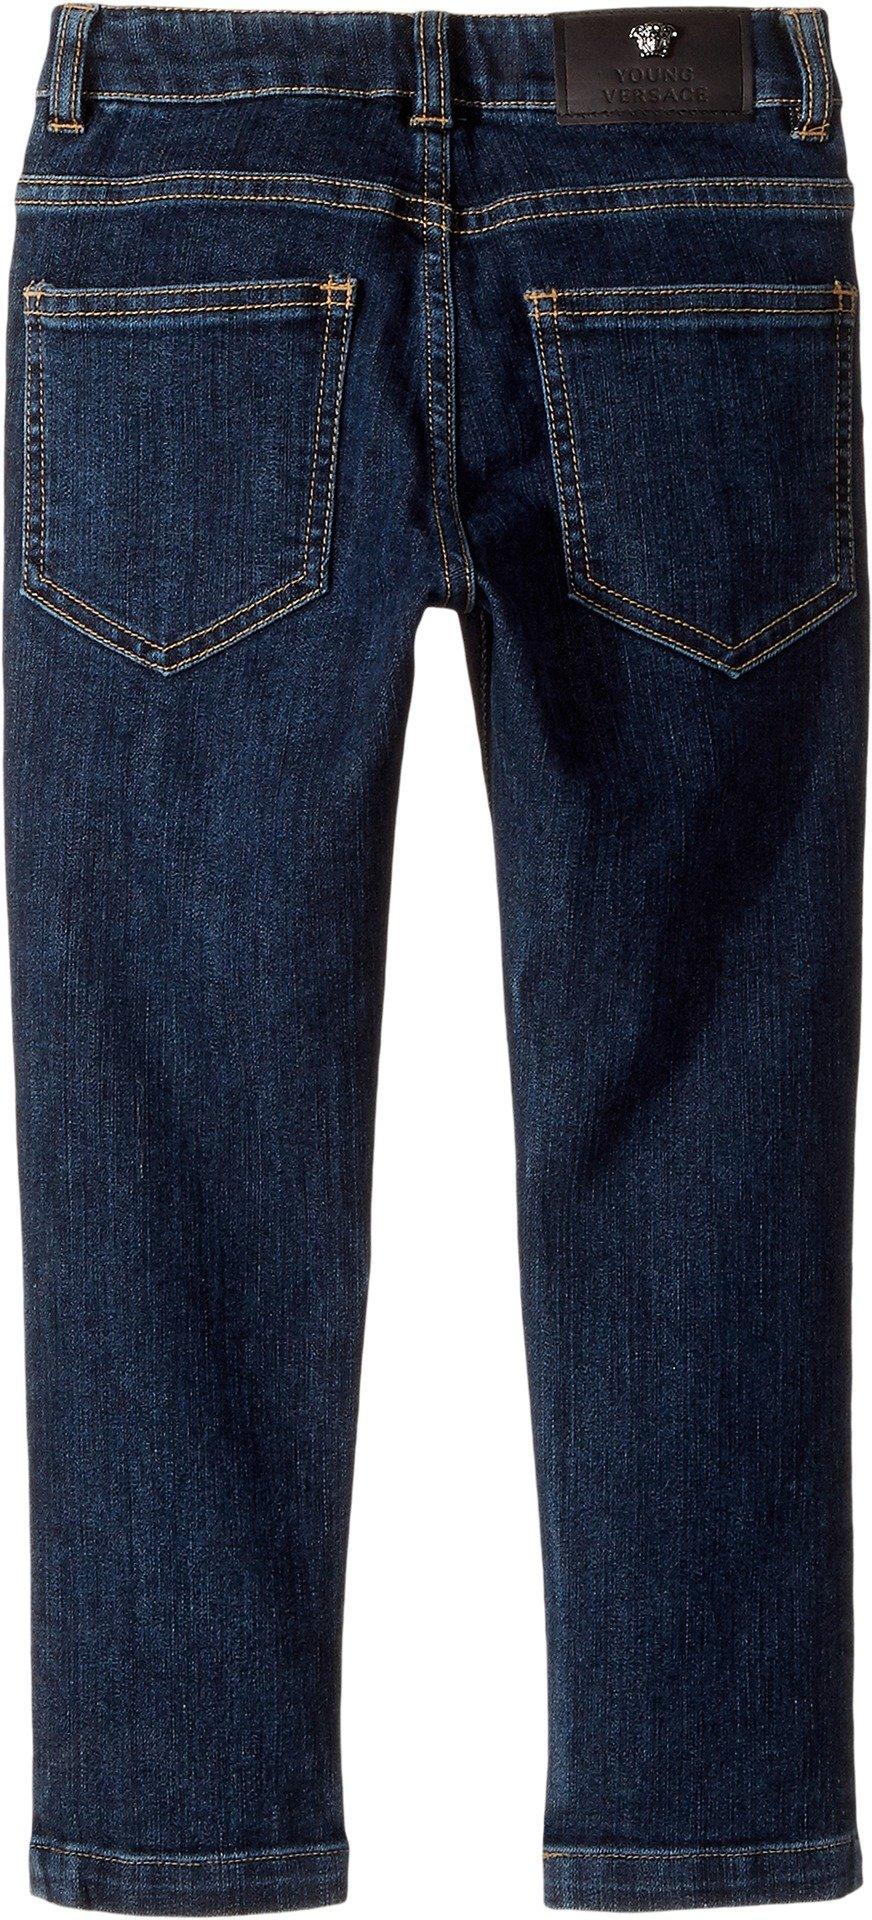 Versace Kids  Baby Boy's Faded Denim Pants (Toddler/Little Kids) Denim Jeans by Versace